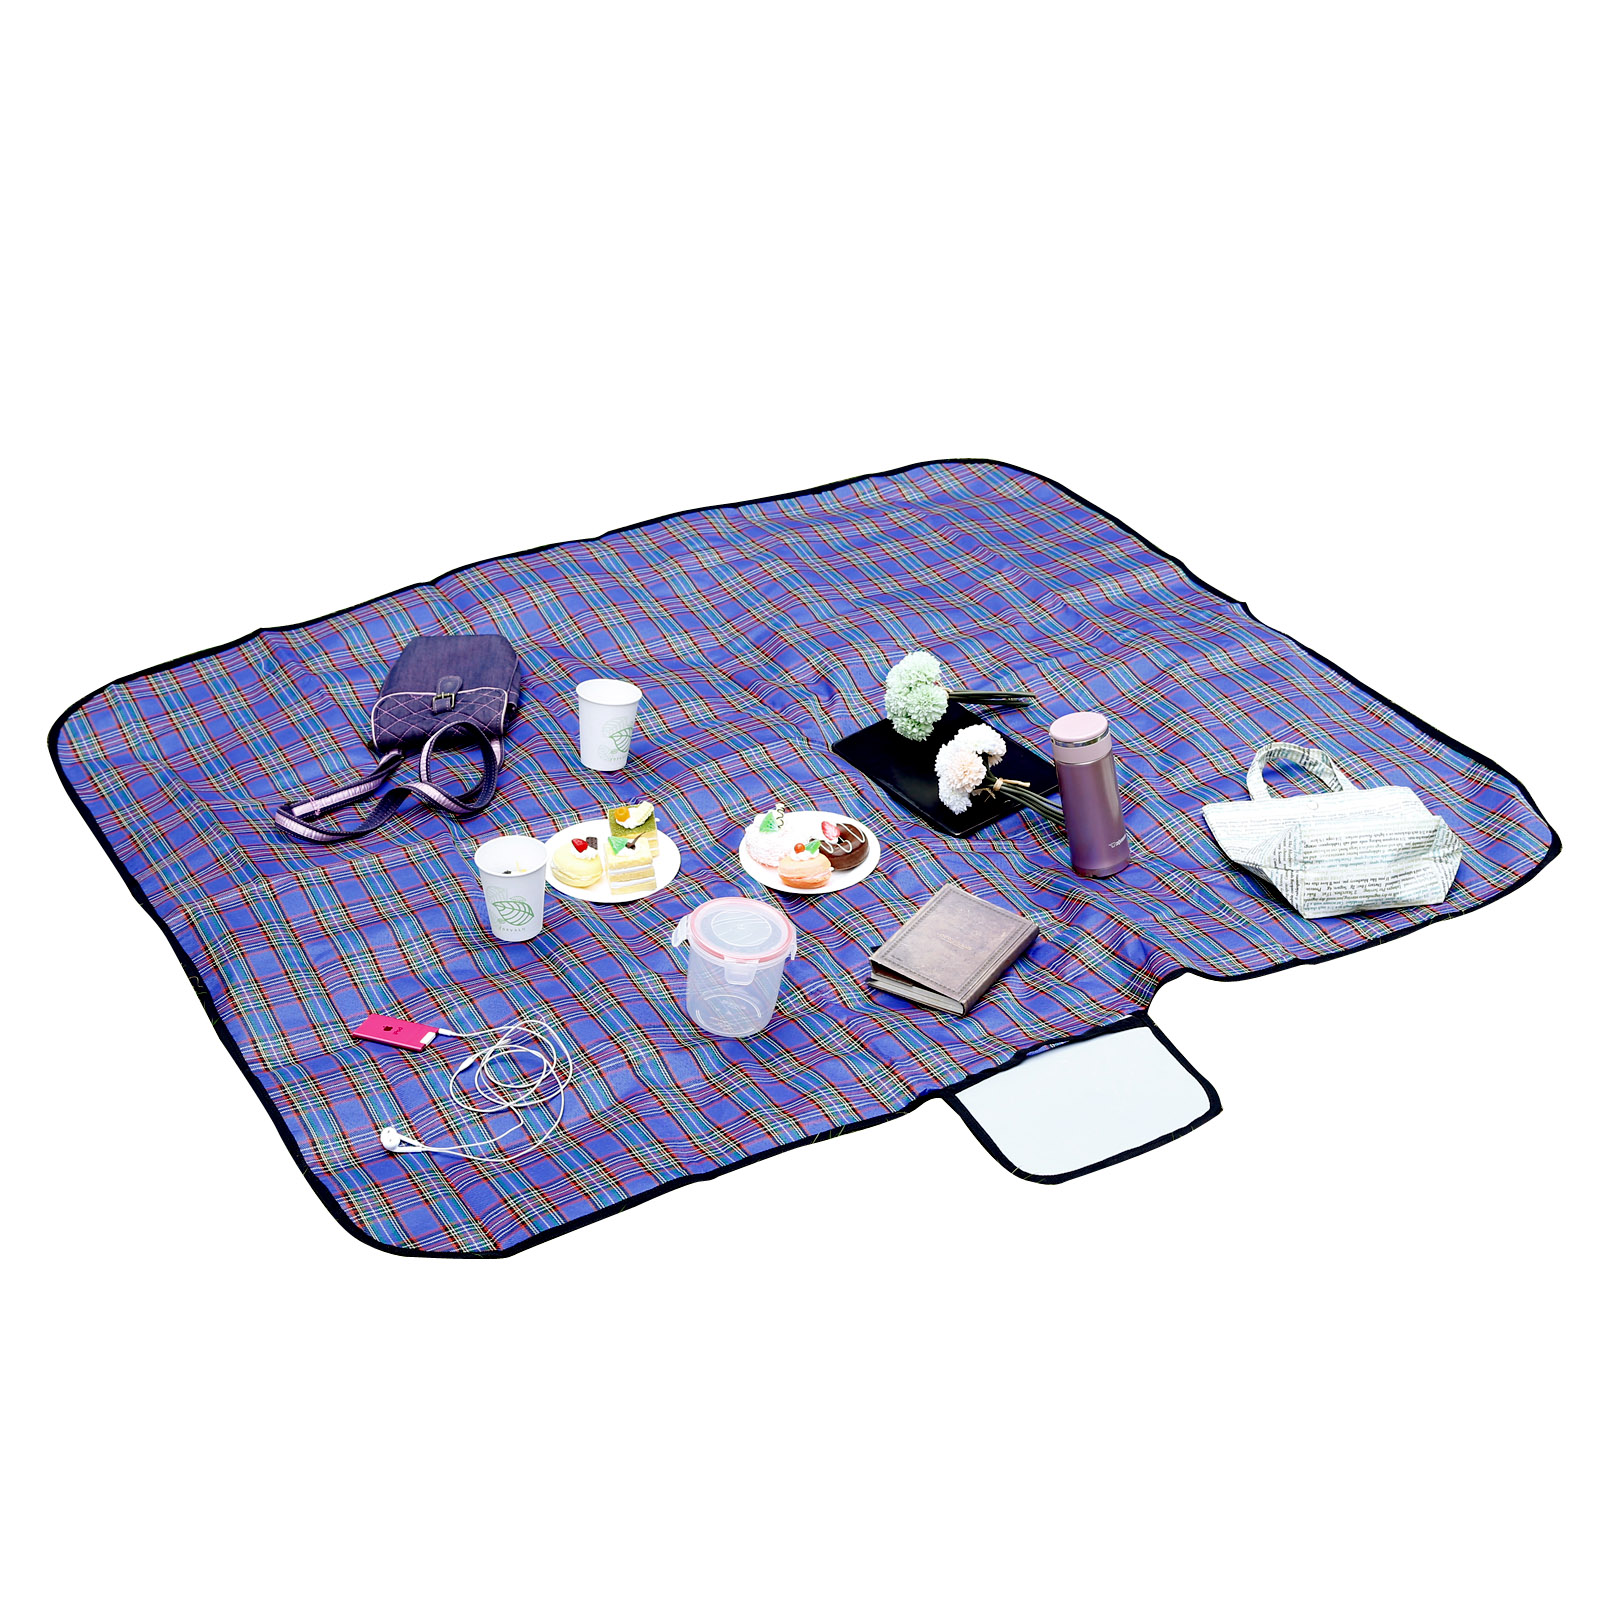 Picnic Blanket: Waterproof Beach Mat Picnic Blanket Portable Camping